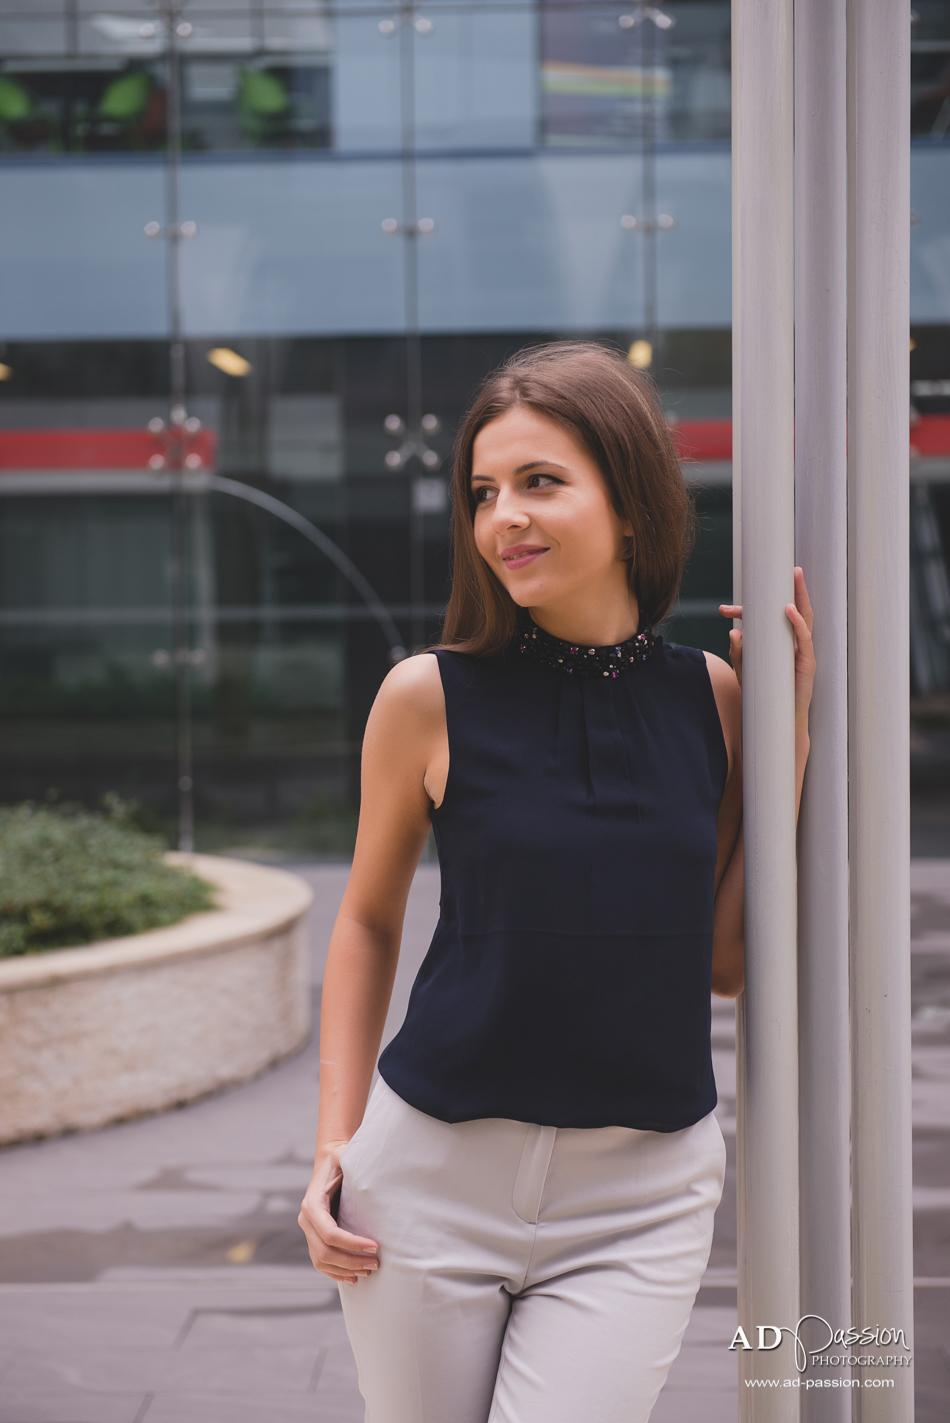 AD Passion Photography | rahela_fotografie-portret-timisoara_0003 | Adelin, Dida, fotograf profesionist, fotograf de nunta, fotografie de nunta, fotograf Timisoara, fotograf Craiova, fotograf Bucuresti, fotograf Arad, nunta Timisoara, nunta Arad, nunta Bucuresti, nunta Craiova